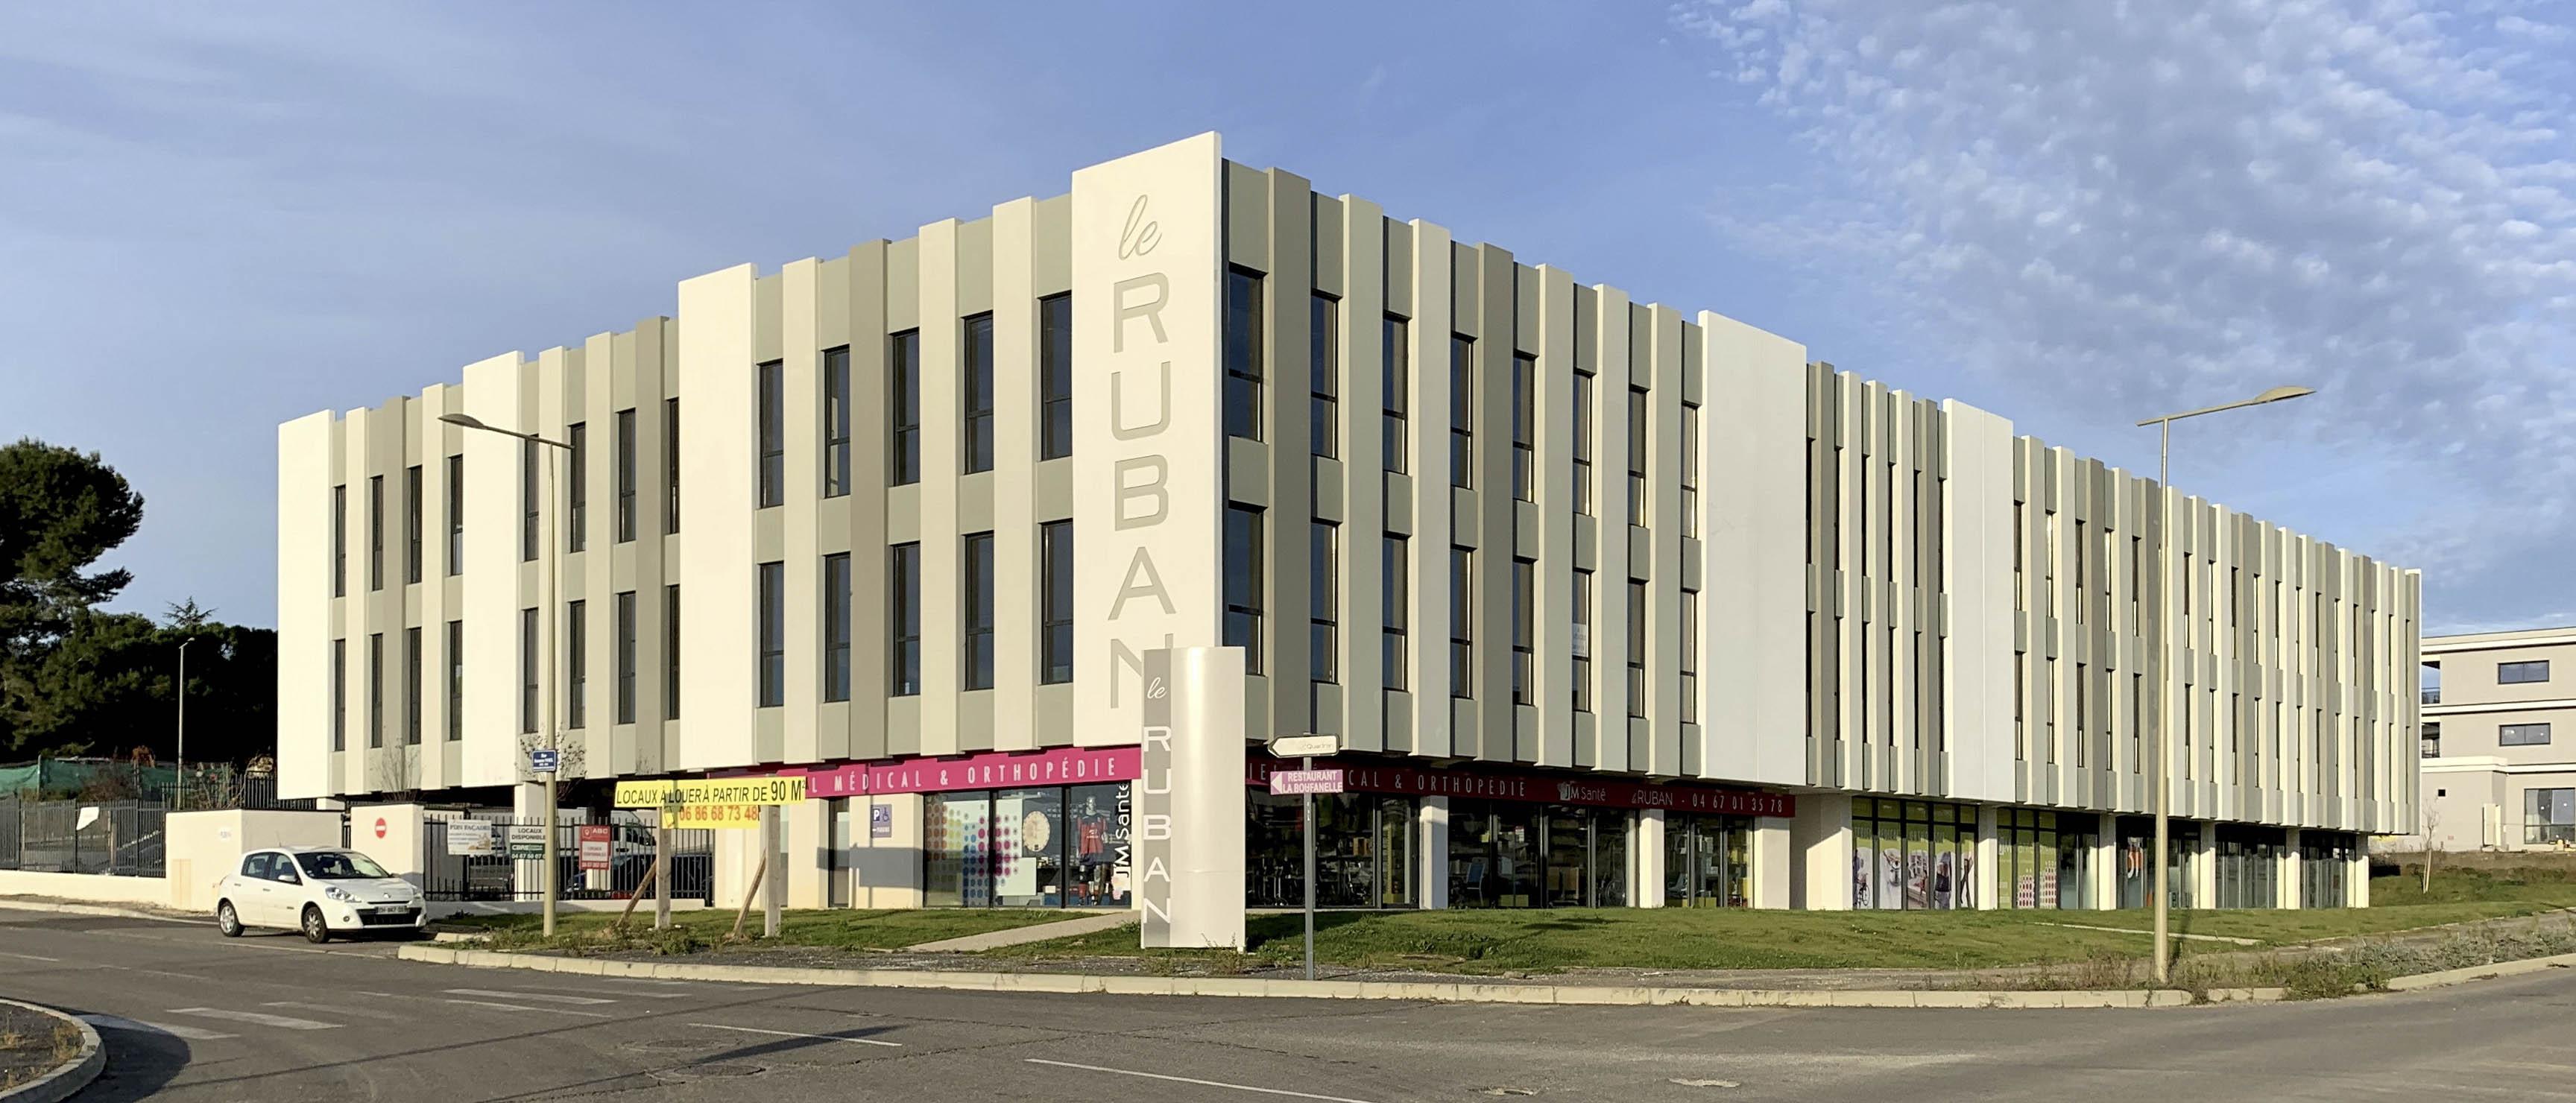 Immeuble le Ruban Béziers BF Architecture 1